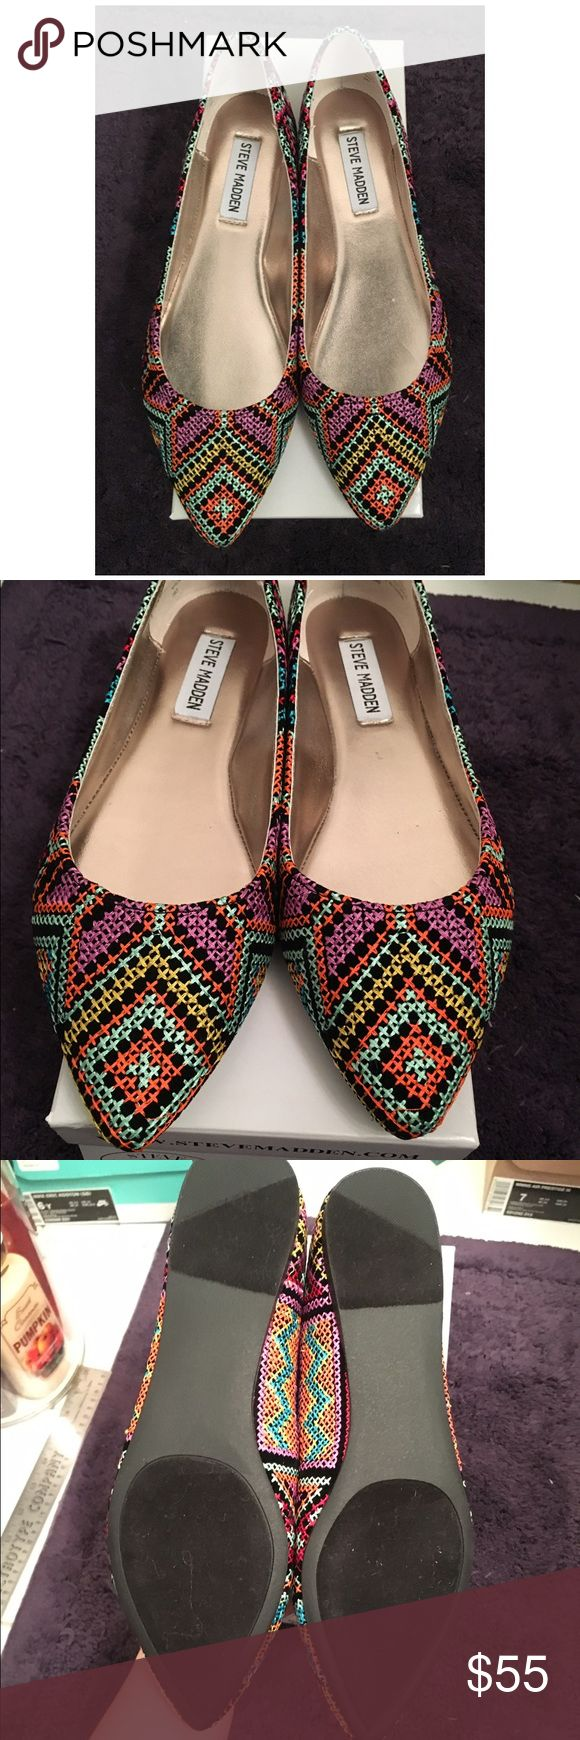 NIB Steve Madden Haanna Aztec Flats NIB. size 7.5 Steve Madden Shoes Flats & Loafers